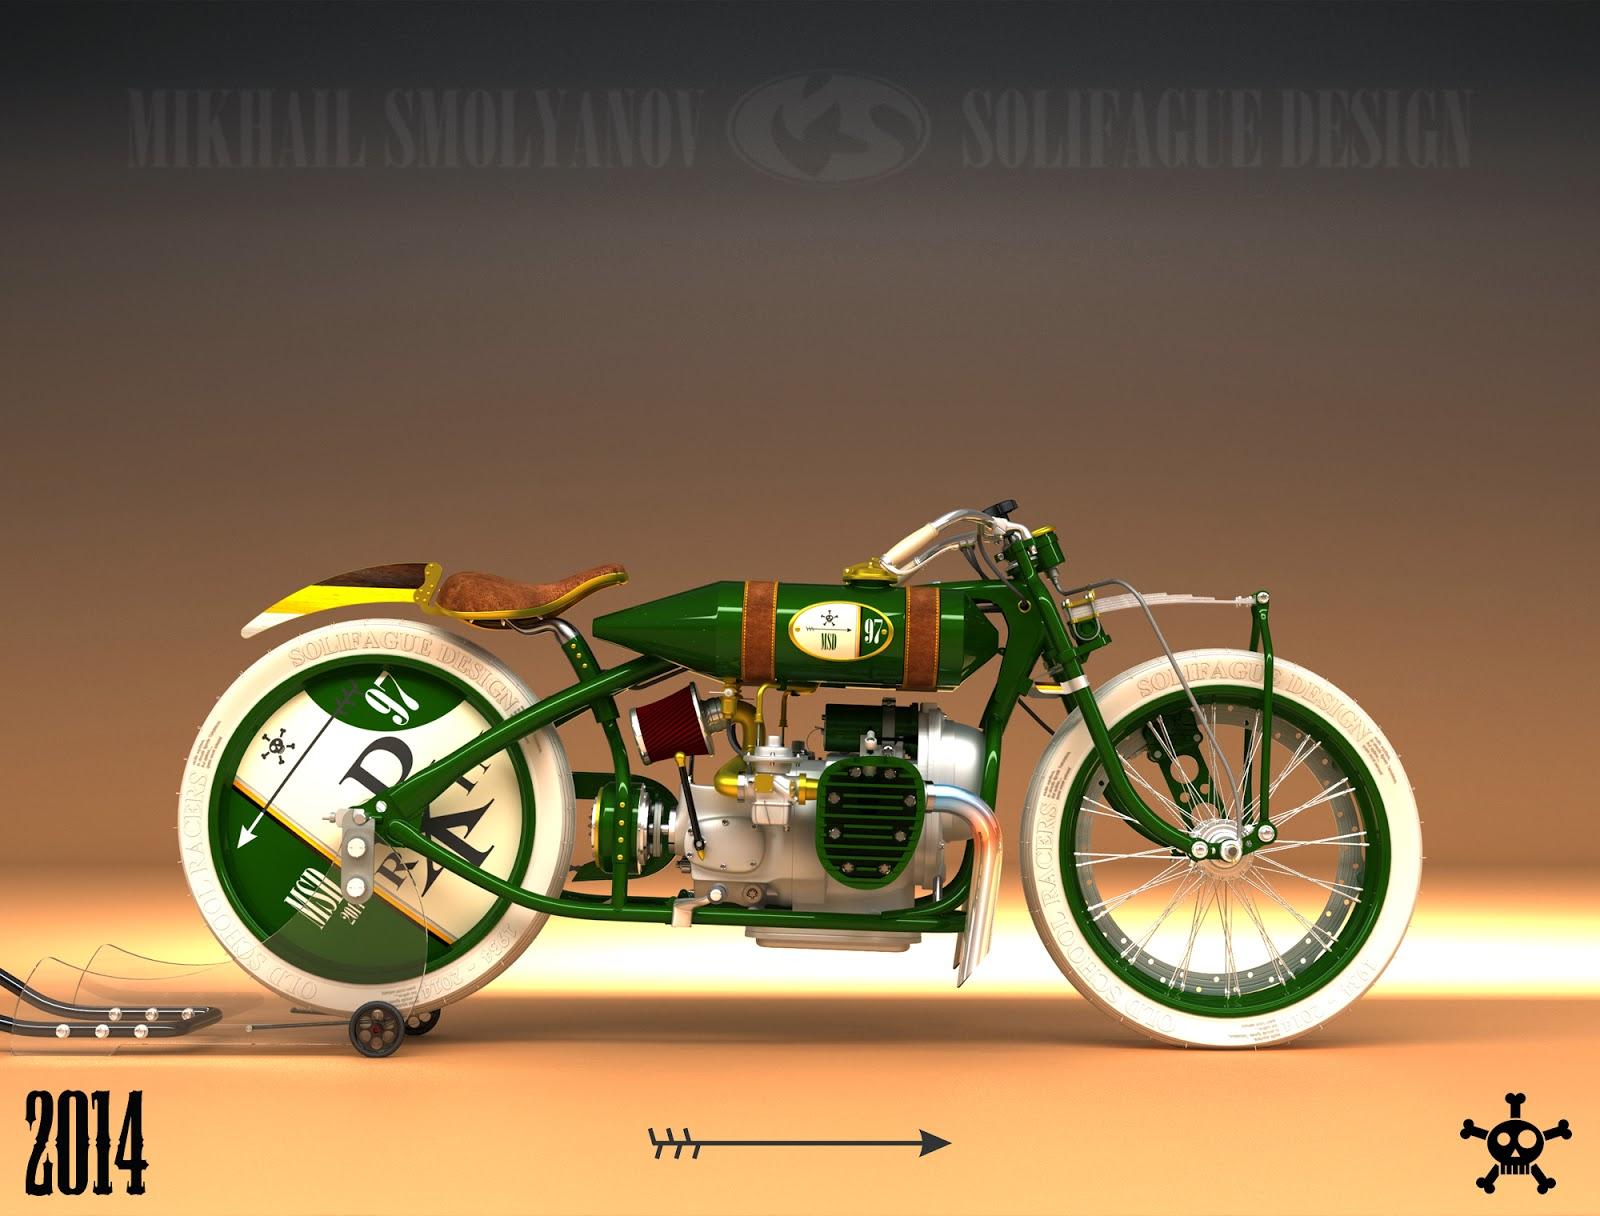 Electric Scooter Bike >> Ural K750-Based Tracker Looks Amazing - autoevolution